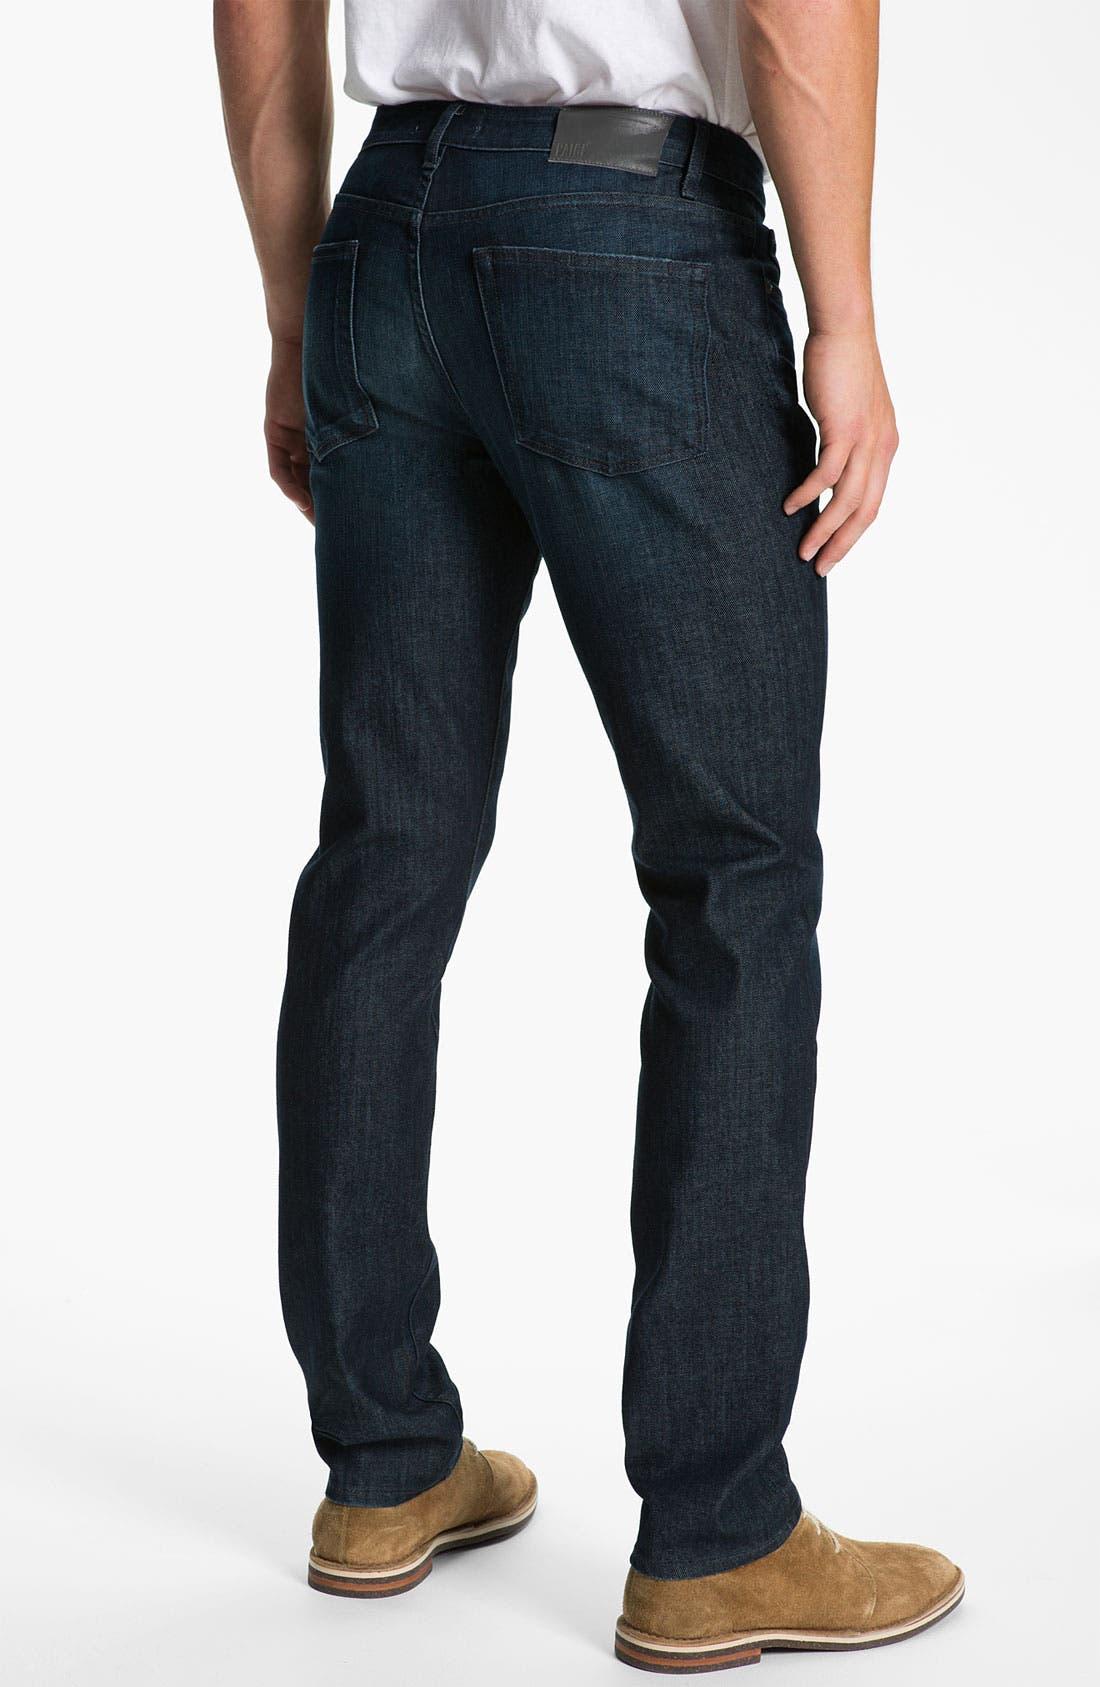 Main Image - PAIGE 'Normandie' Slim Straight Leg Jeans (Warrior)